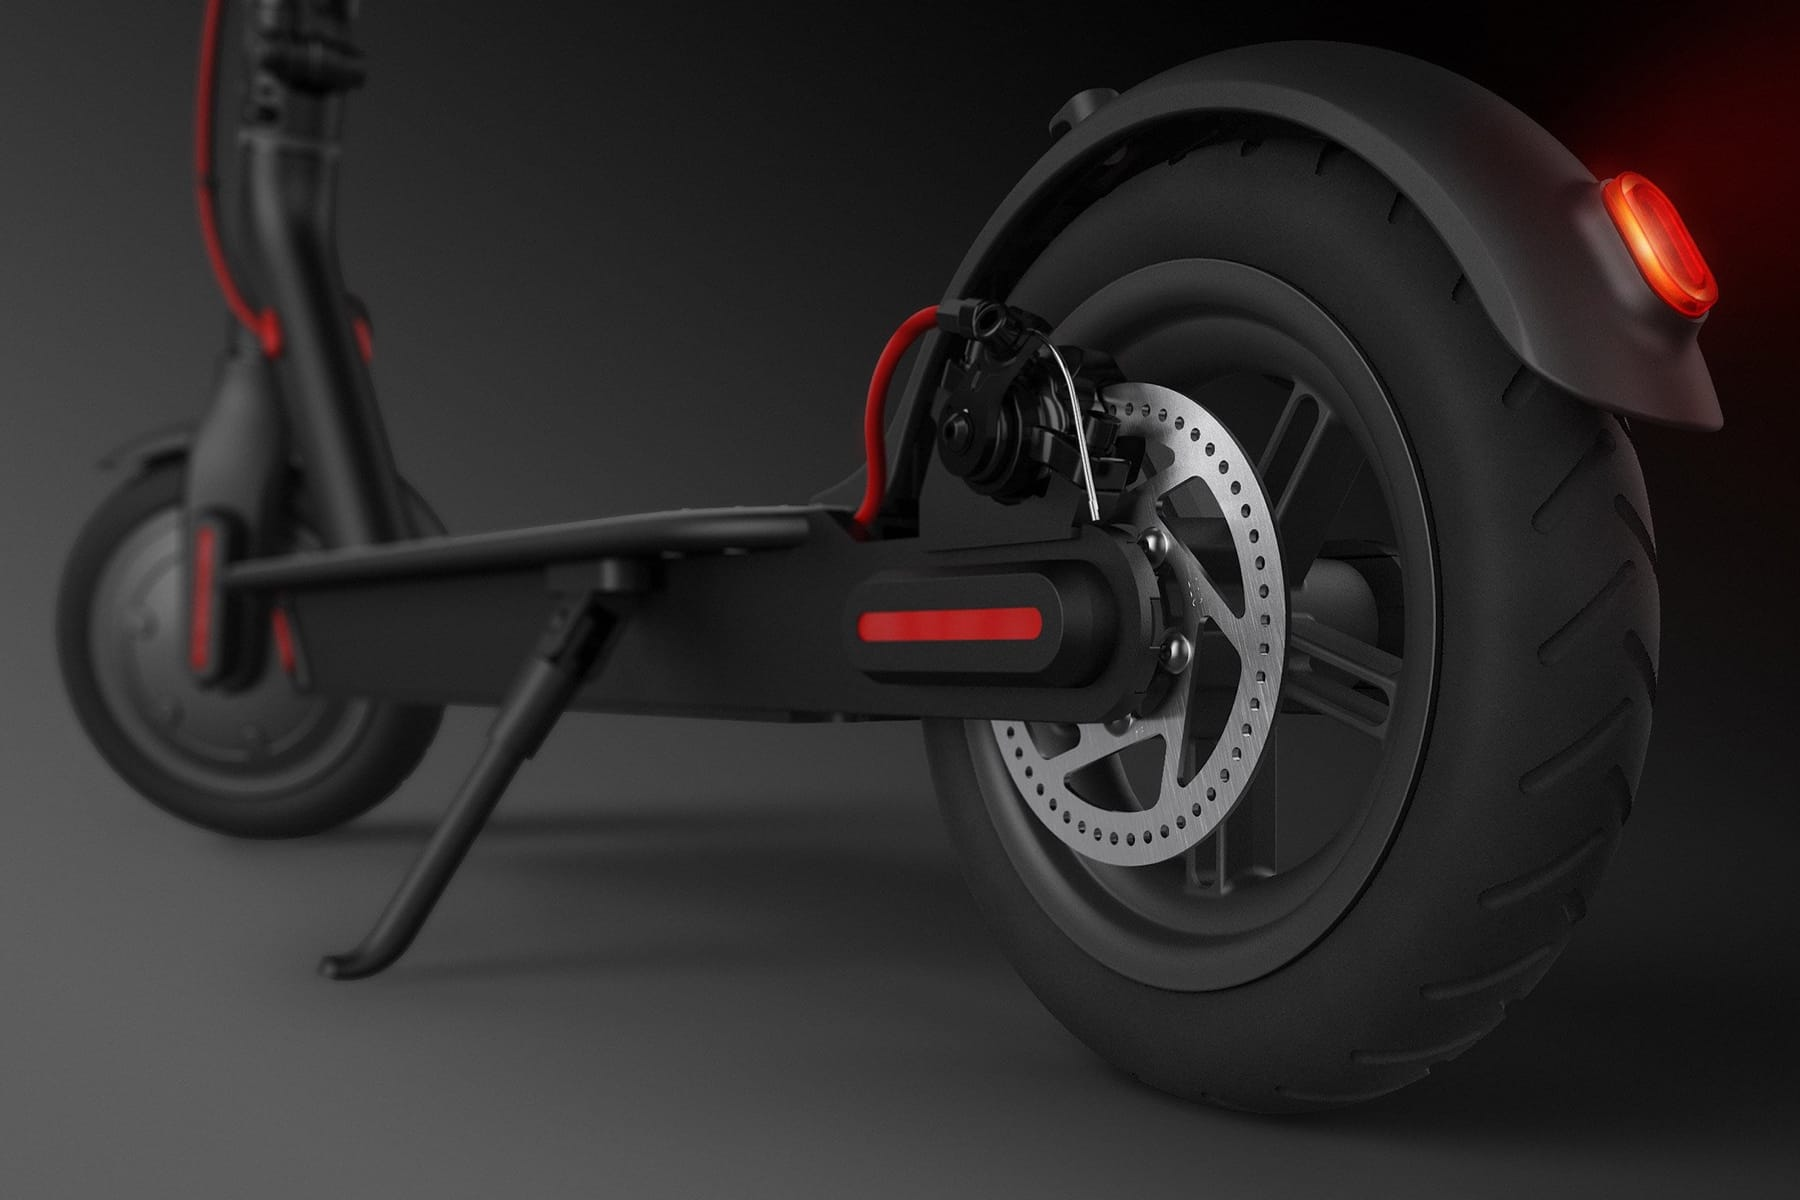 Картинки по запросу Электросамокат Xiaomi Mijia Electric Scooter Pro